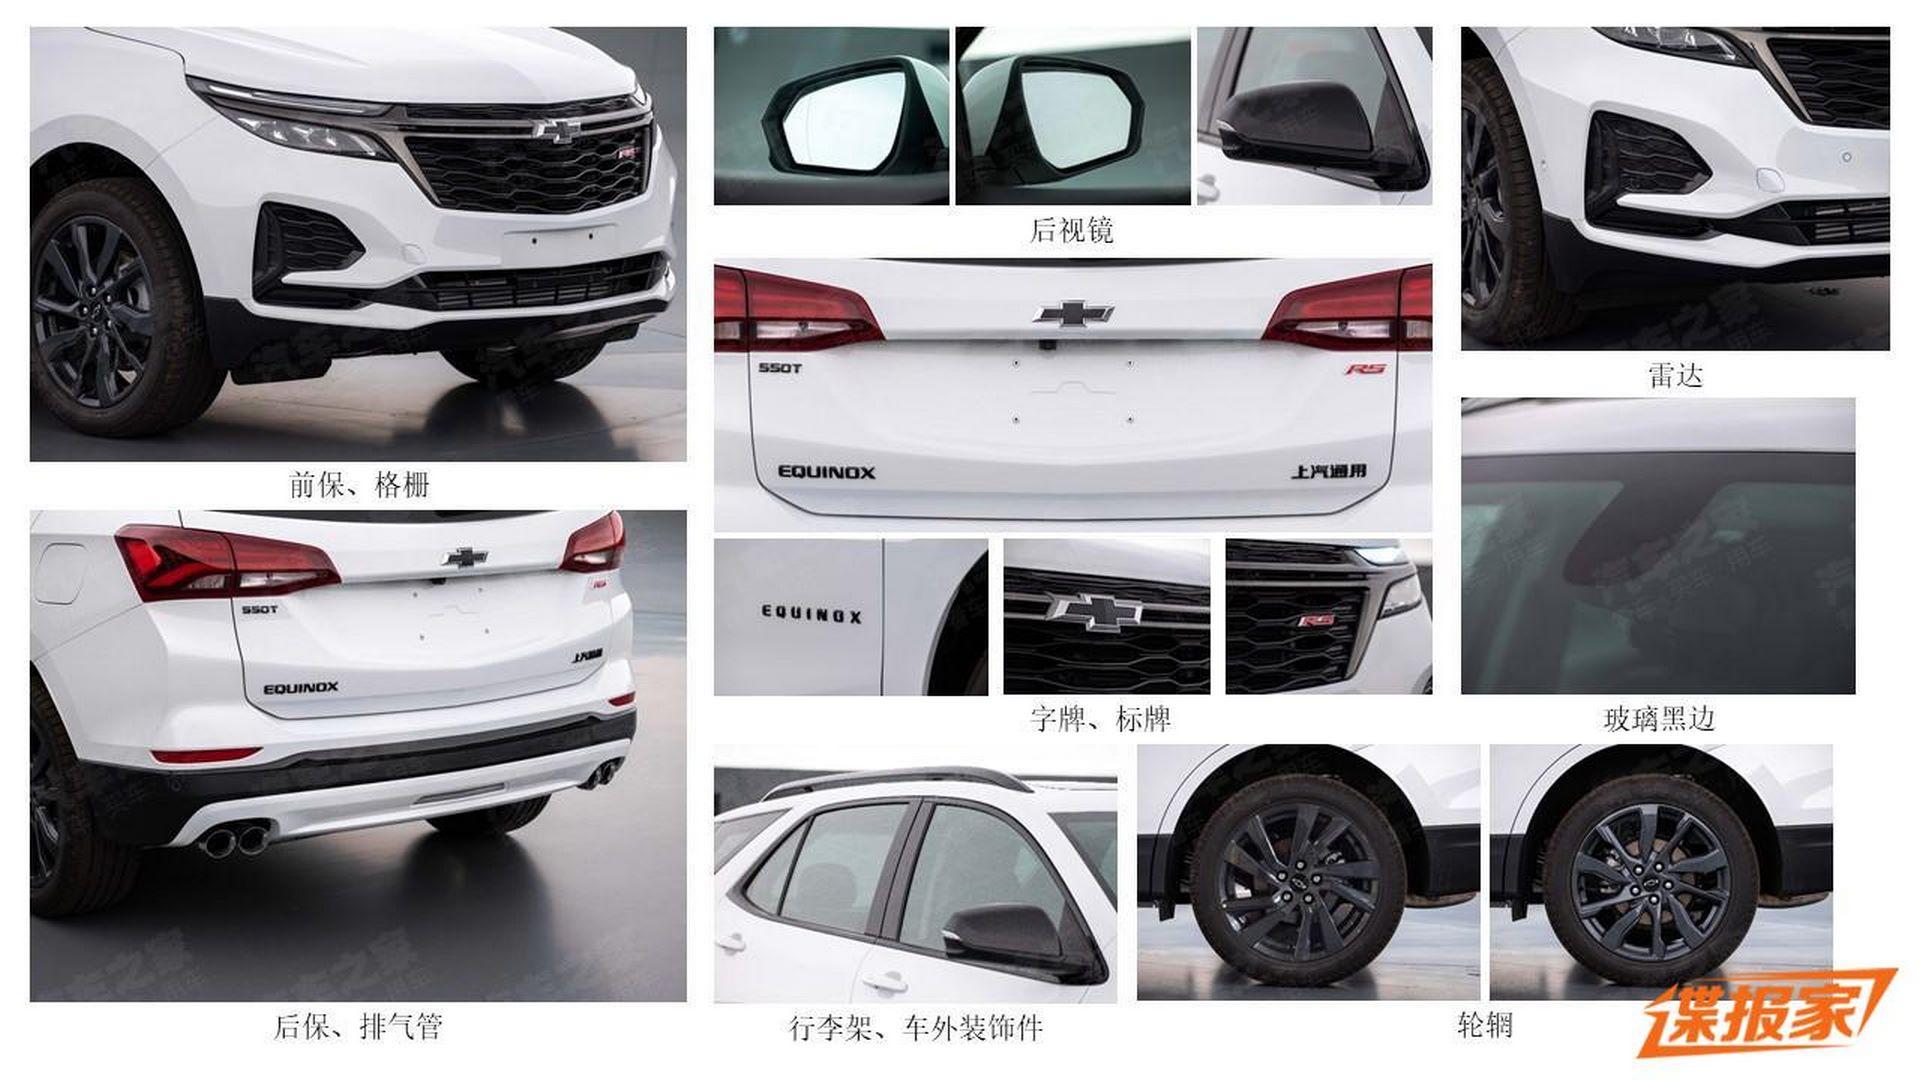 Chevrolet-Equinox-3